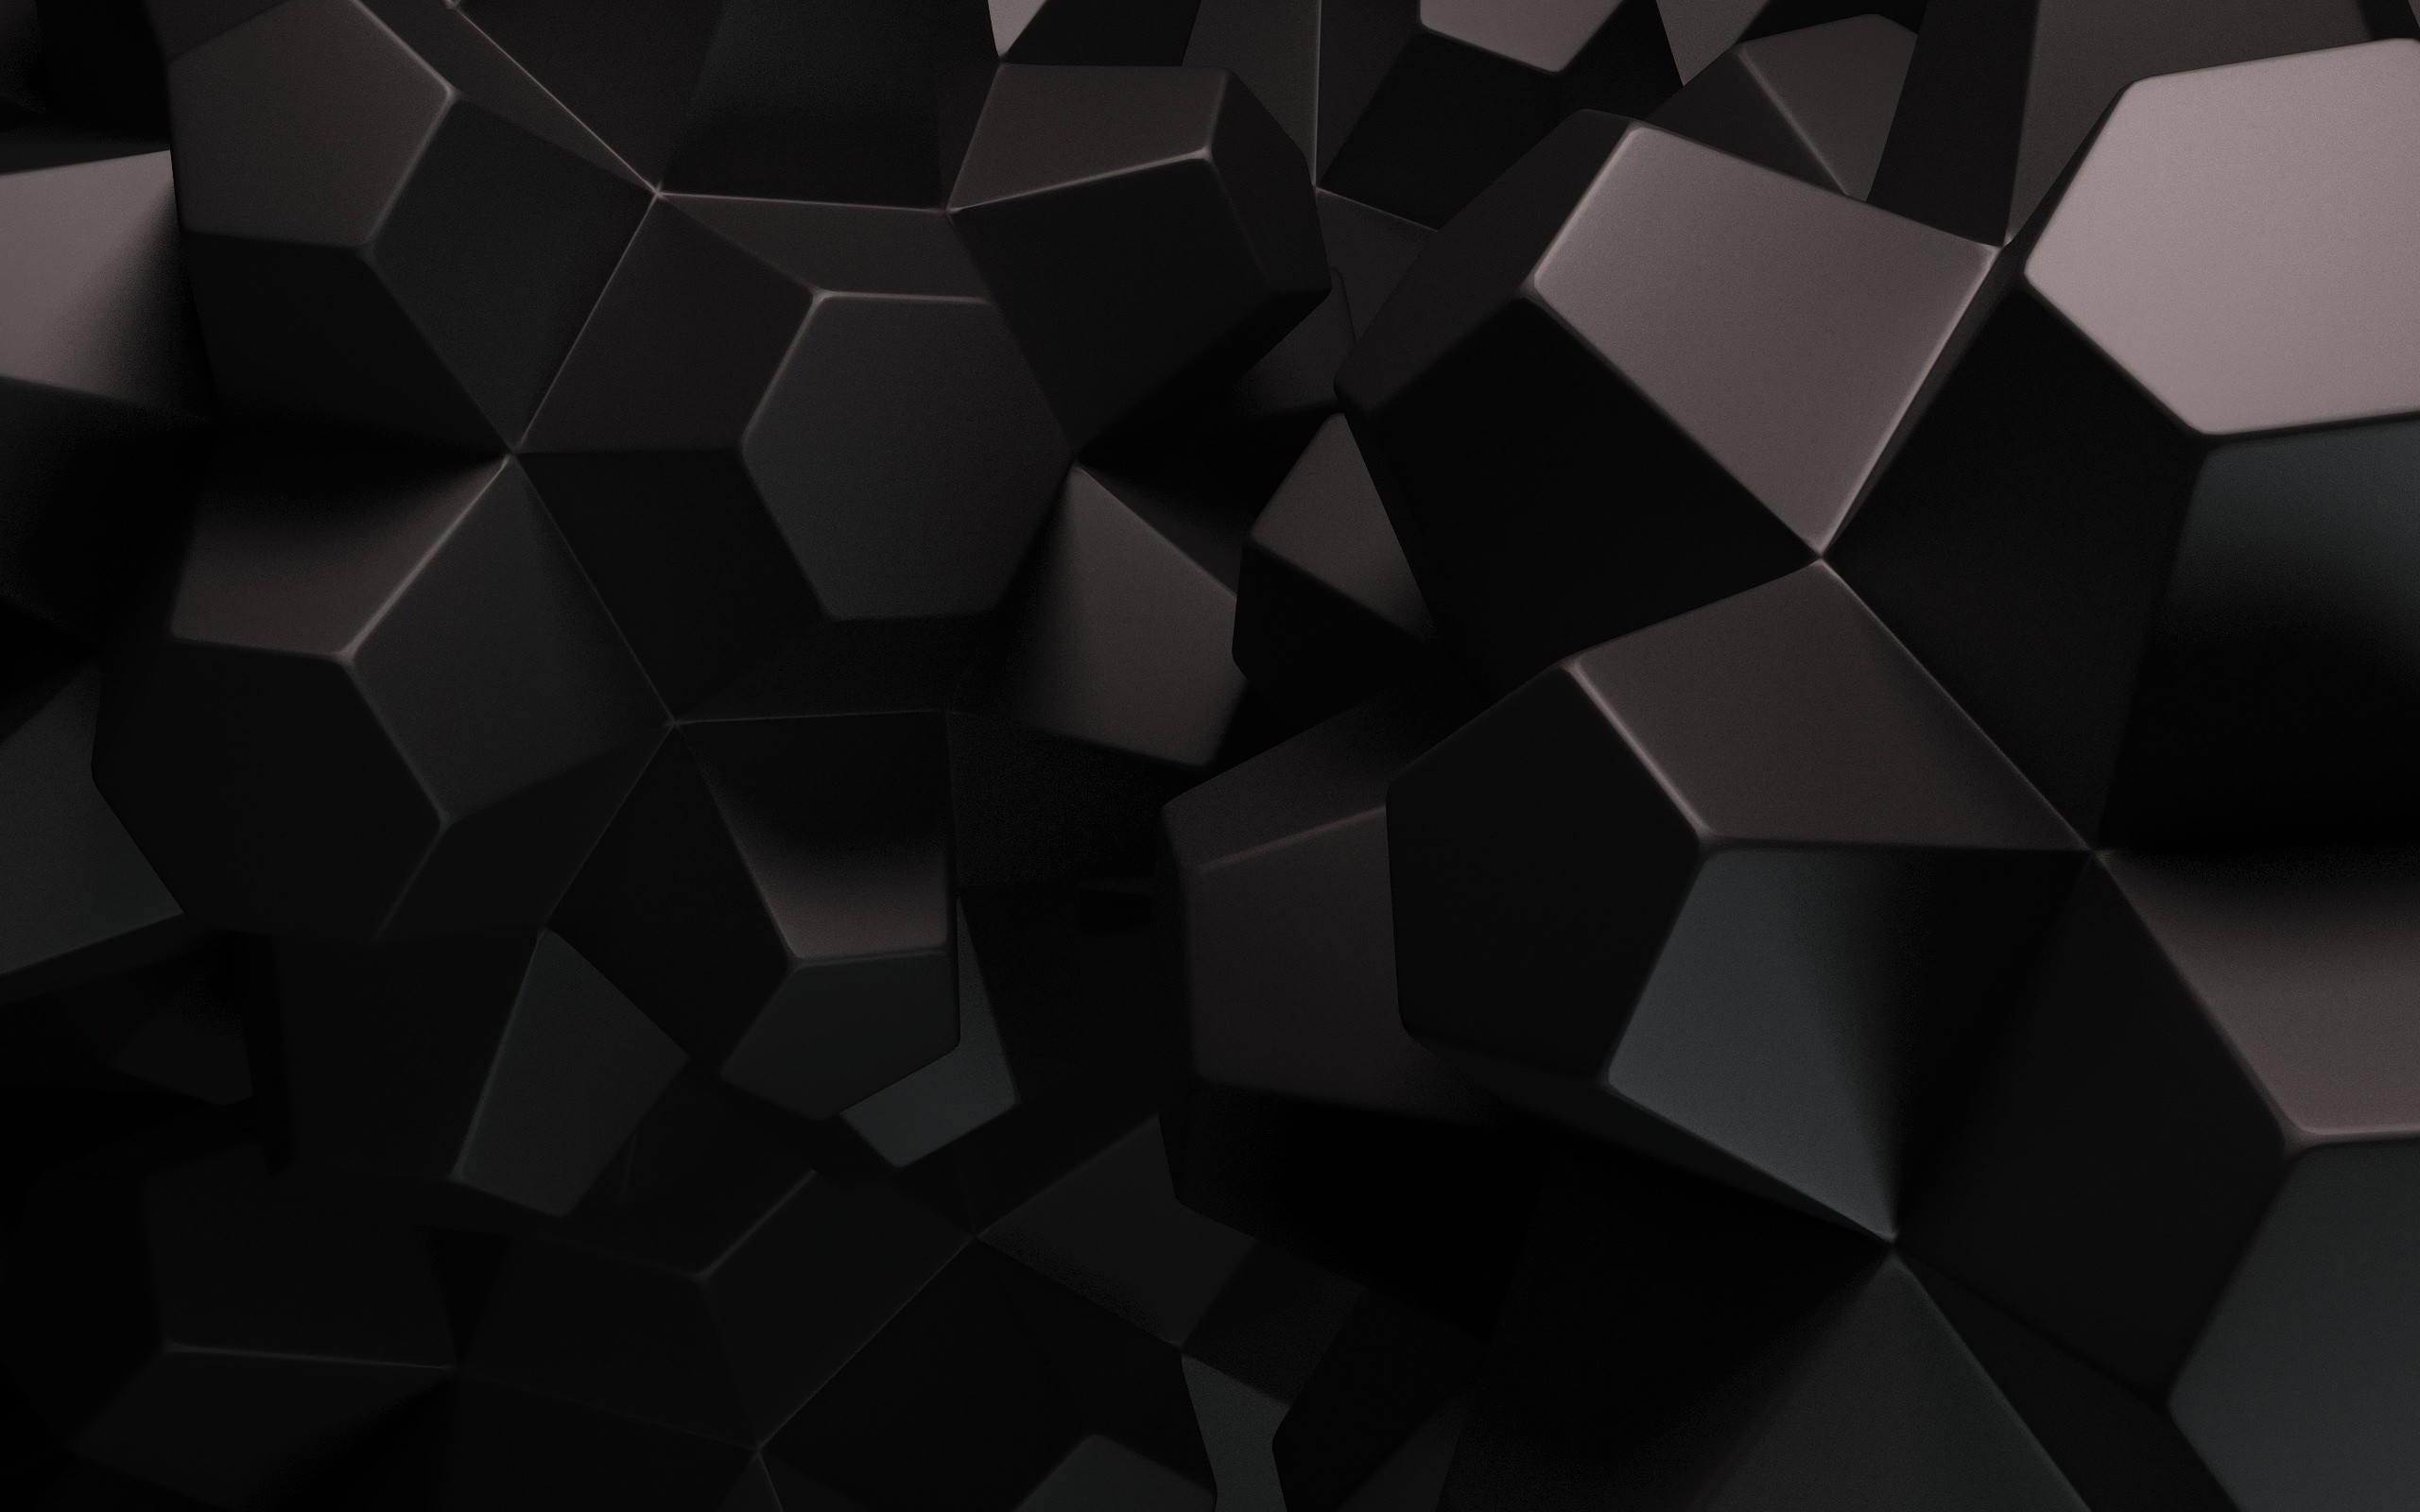 Abstract Black Shapes desktop PC and Mac wallpaper